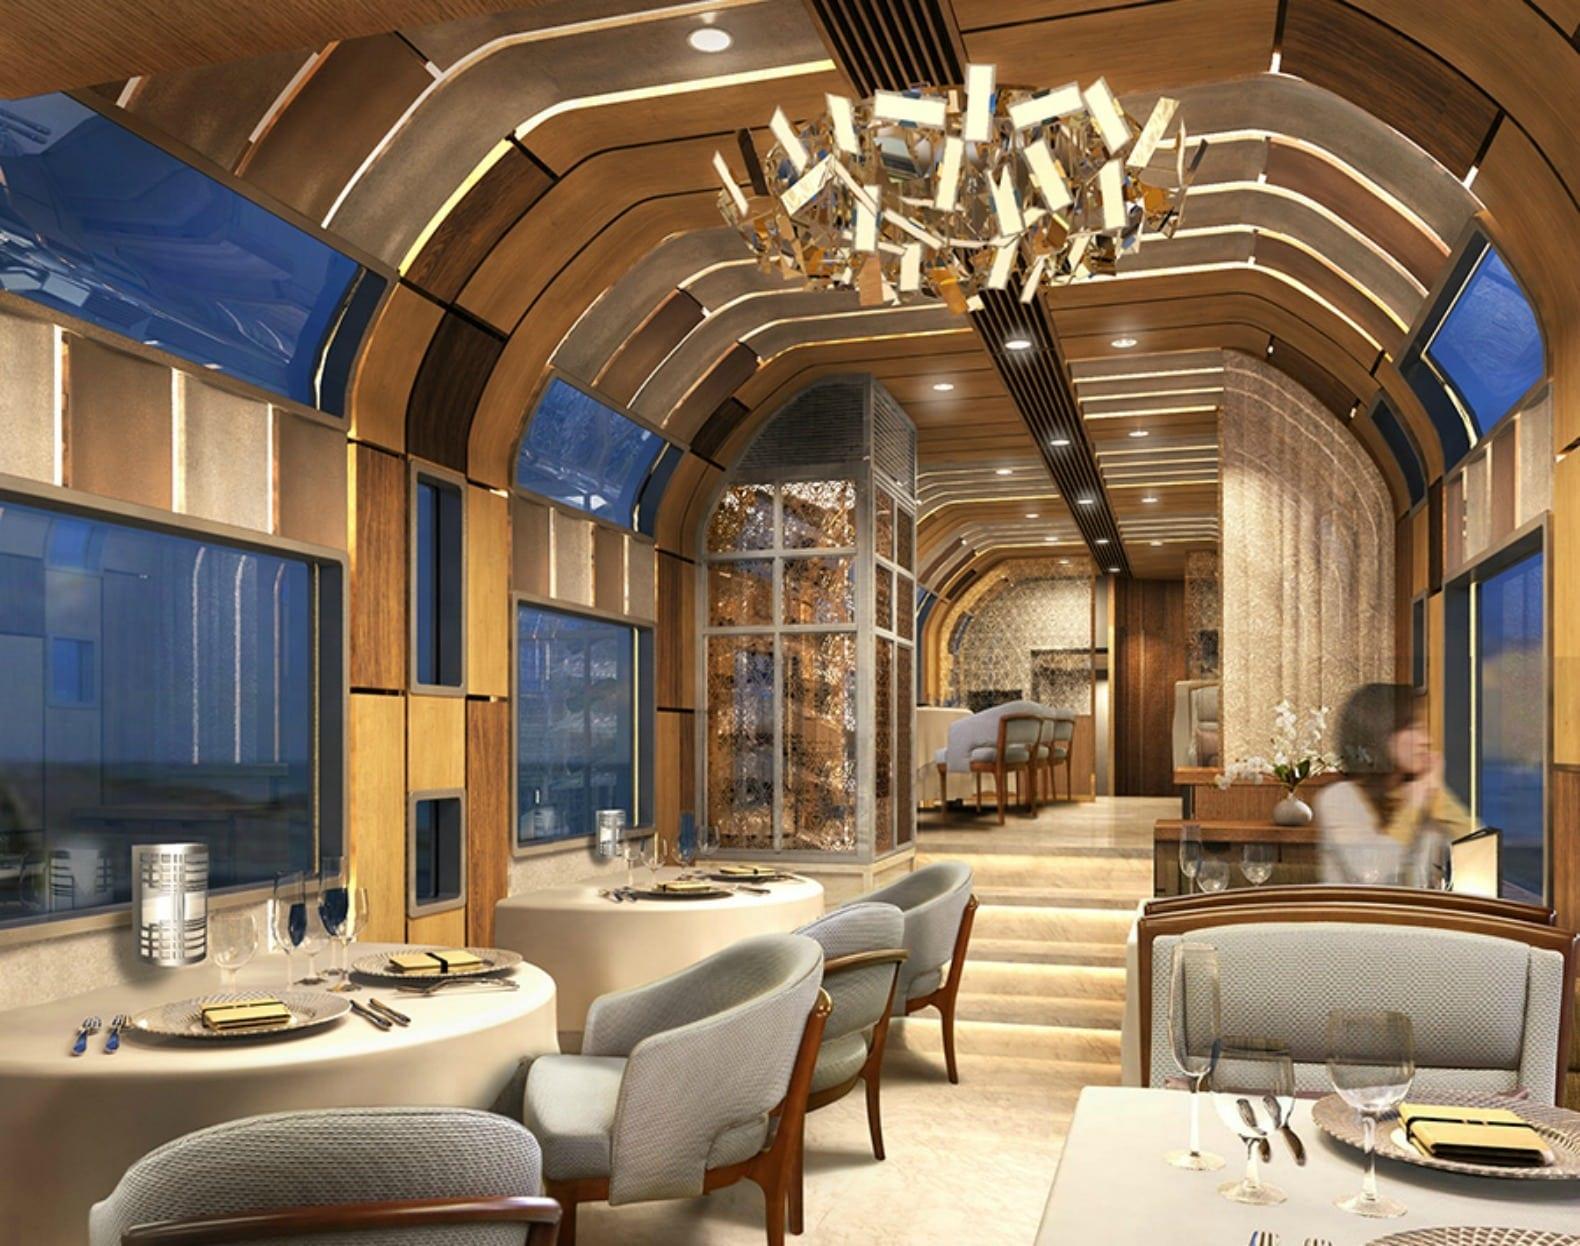 Train Suite Shiki shima12 - Shiki-Shima Cel mai luxos tren din Japonia